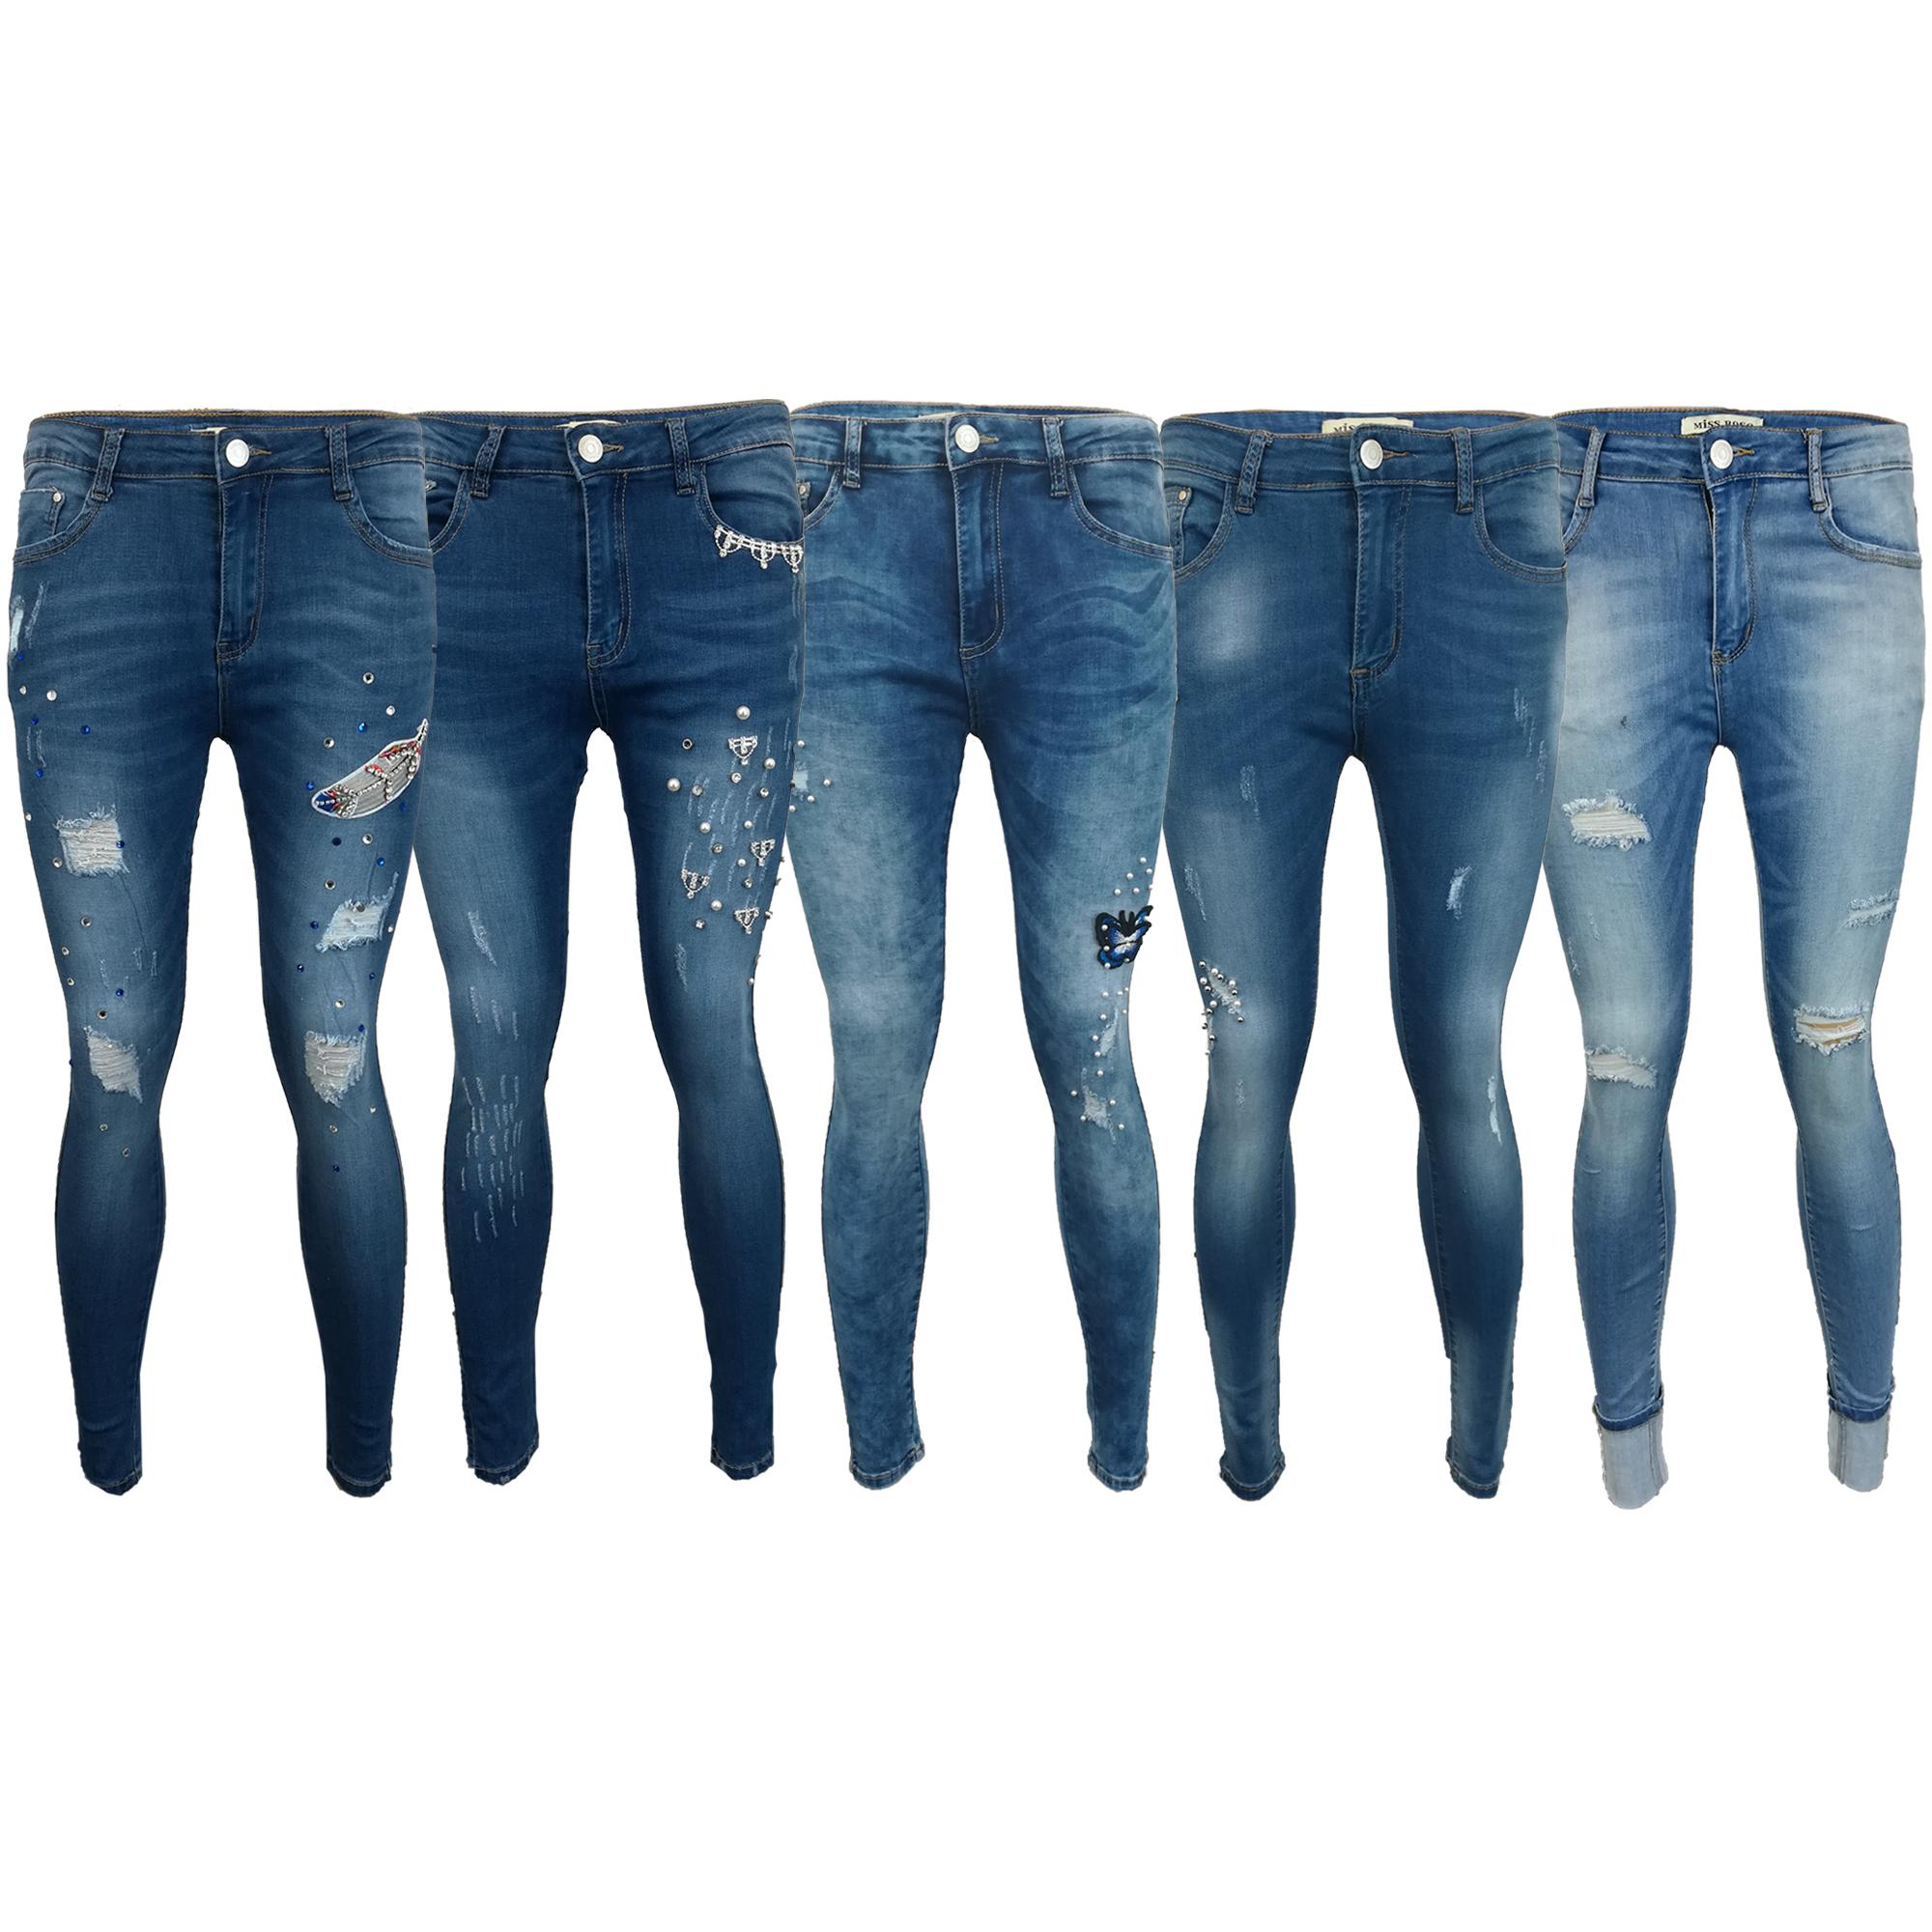 d47a76b5e Ladies Jeans Womens Pants Denim Skinny Slim Fit Trousers Ripped ...